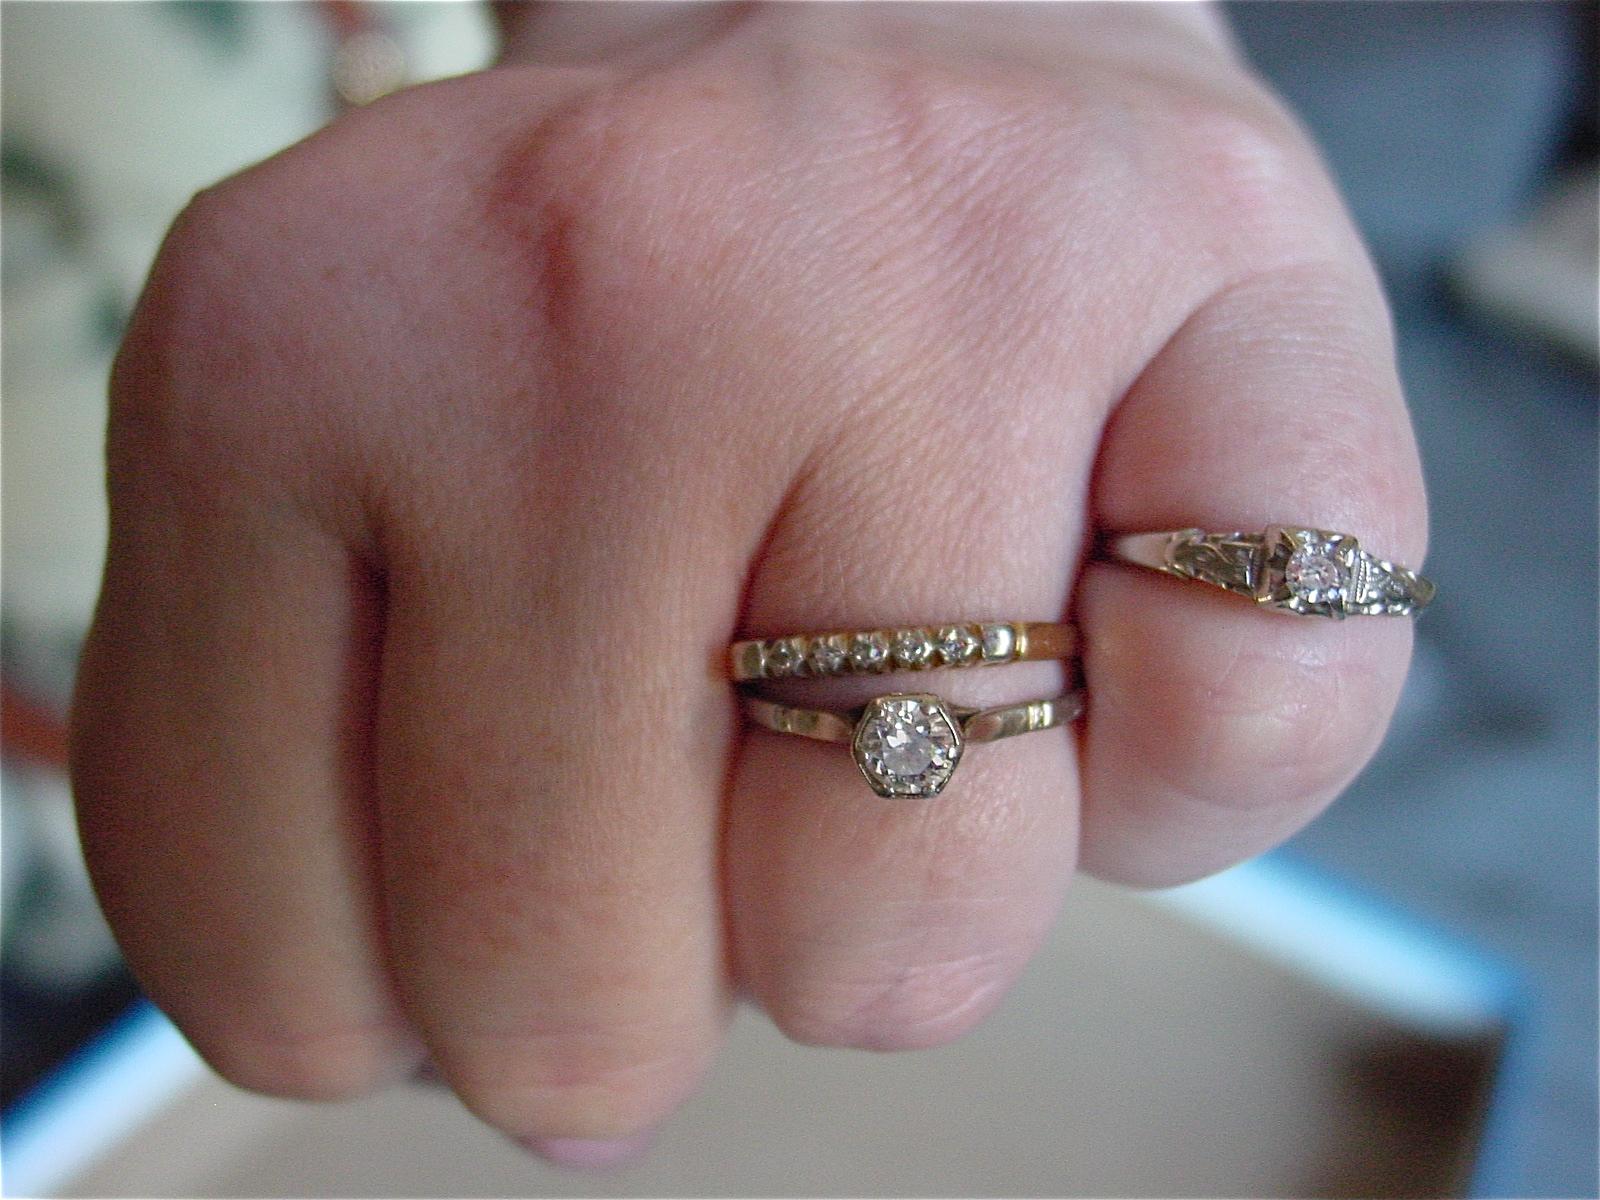 a good old fashioned hunting trip pt 1 jewels labradorite wedding ring Birks White Gold Engagement Ring